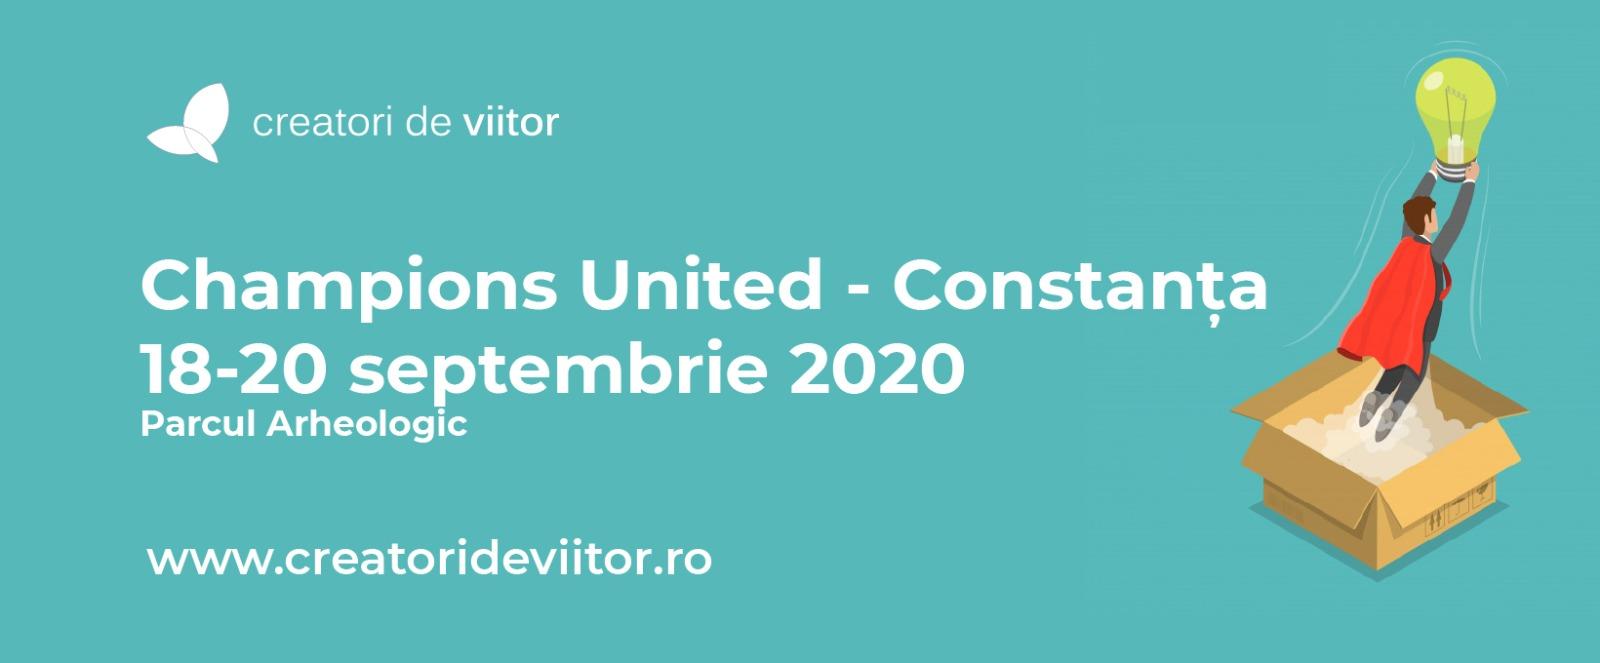 Champions United - Constanta